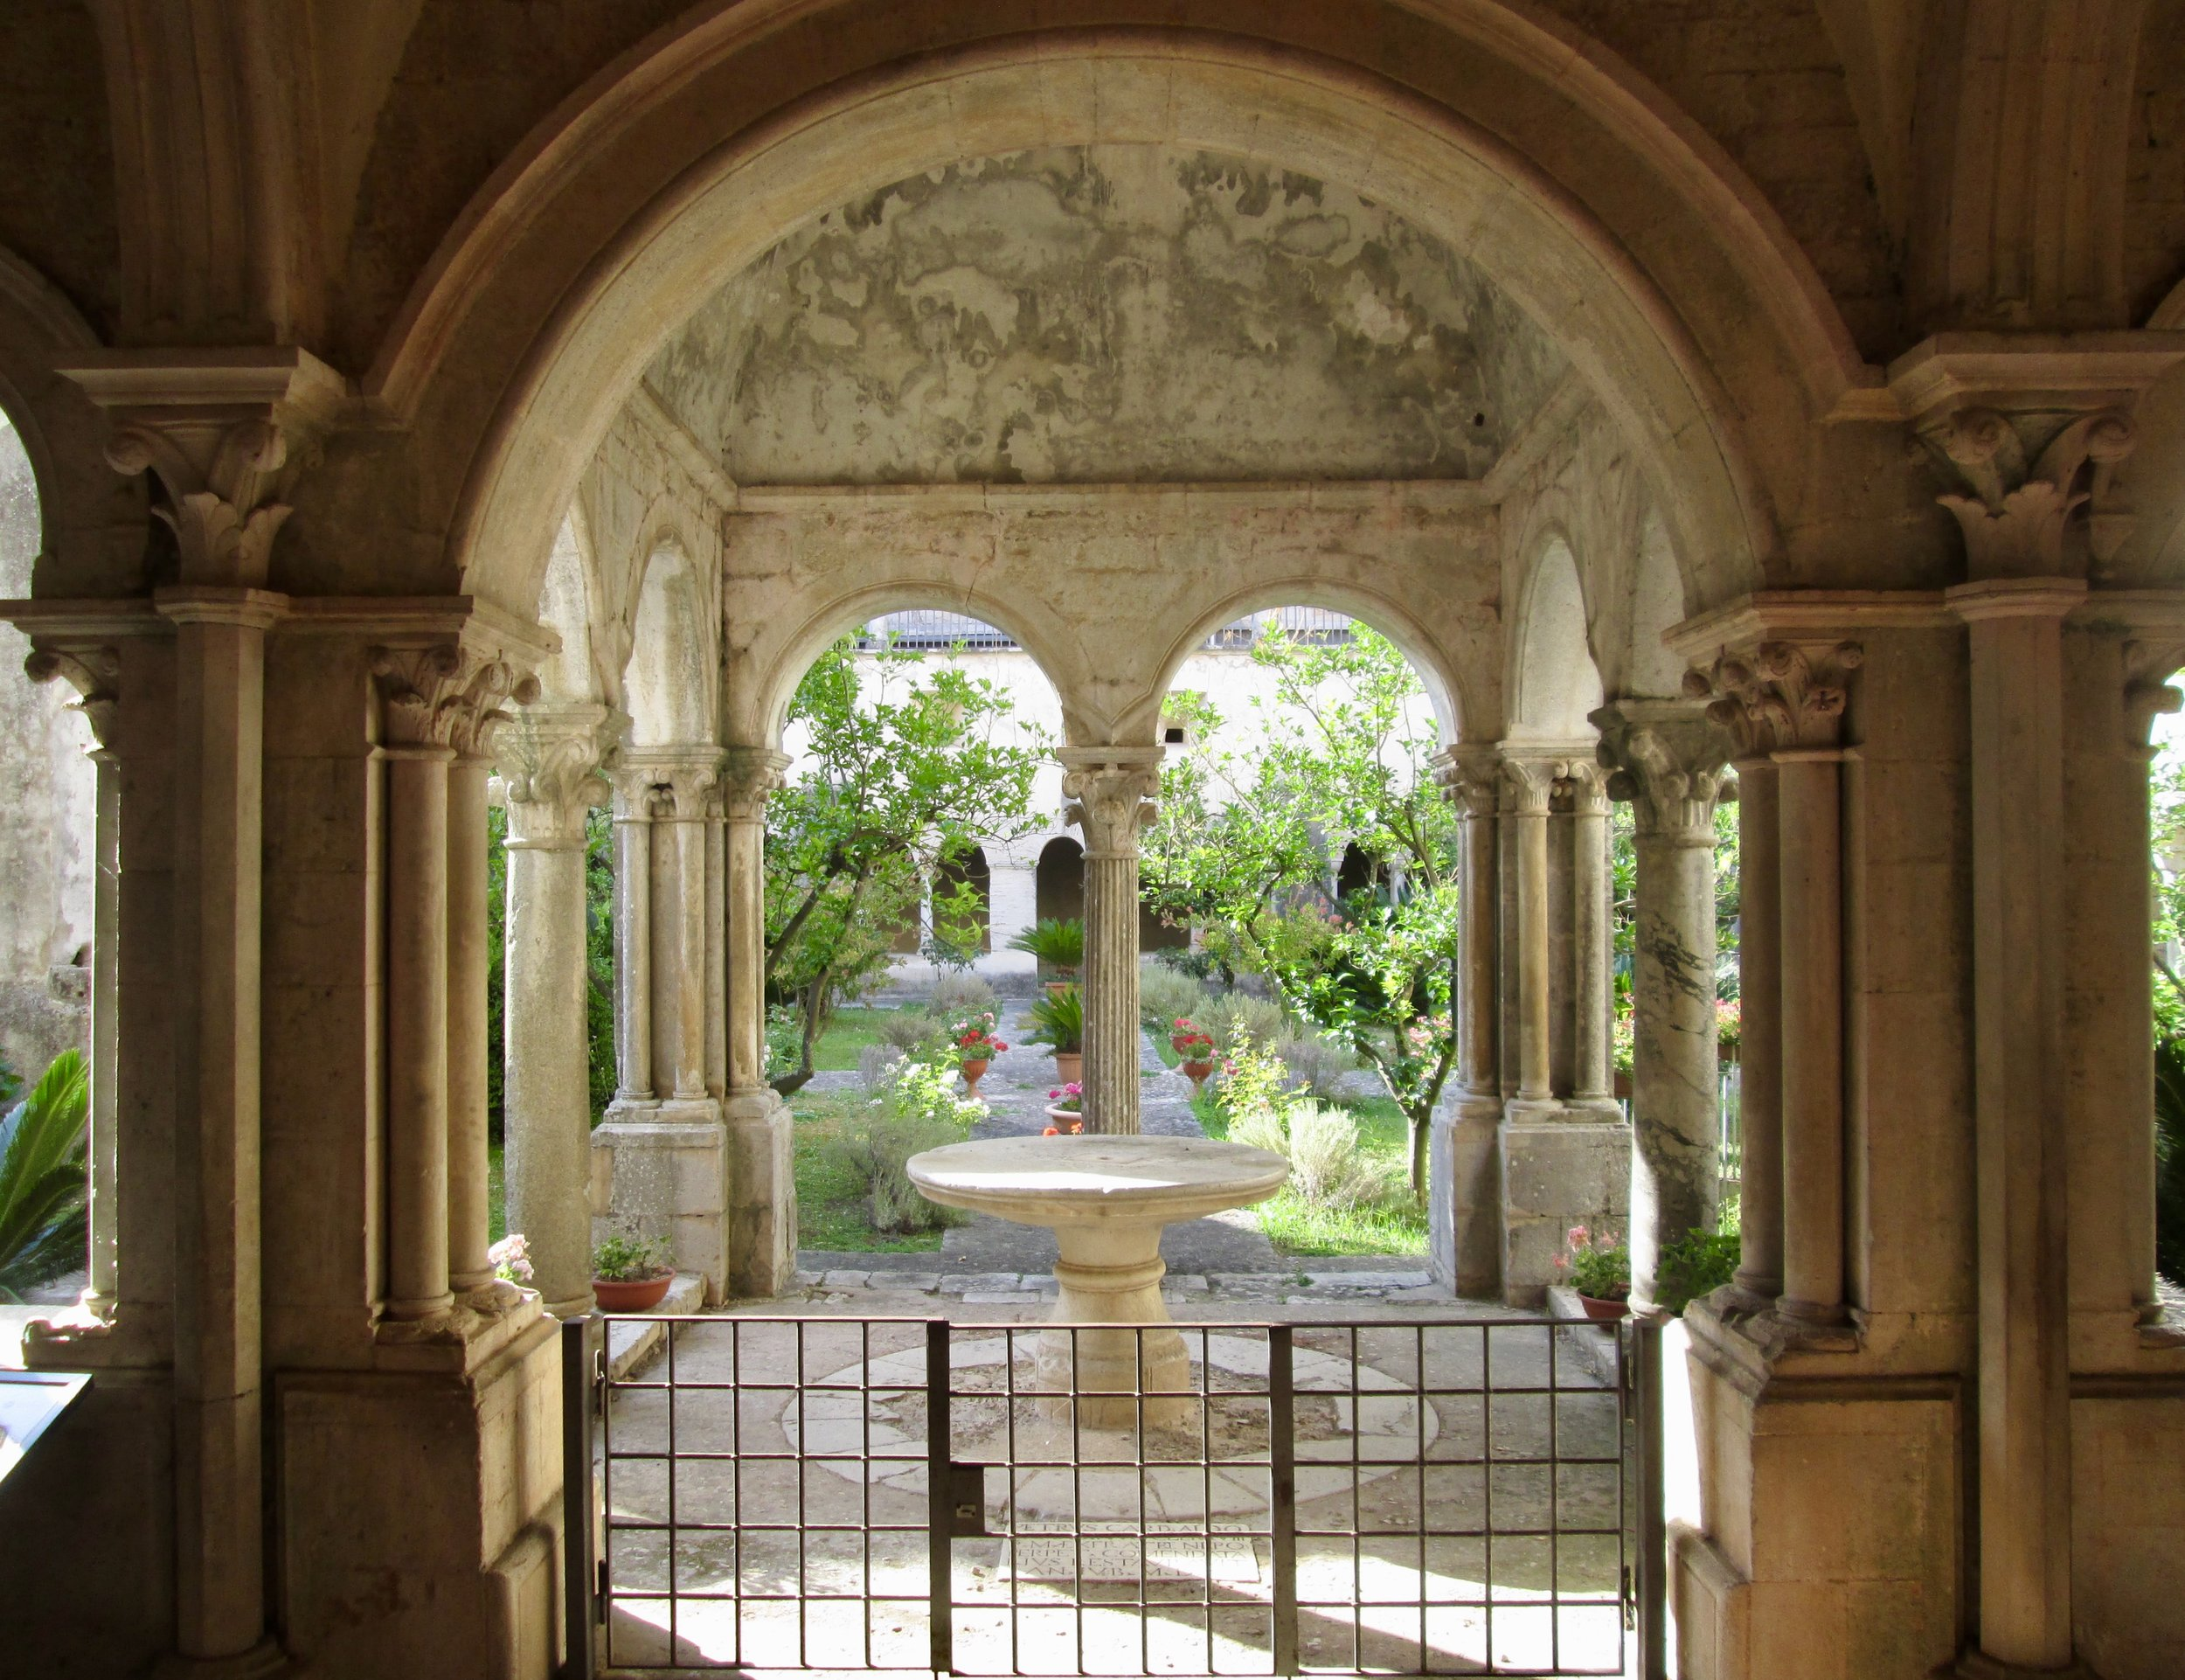 cloister garden in fossanova monastery Photo credit: daniel dikman